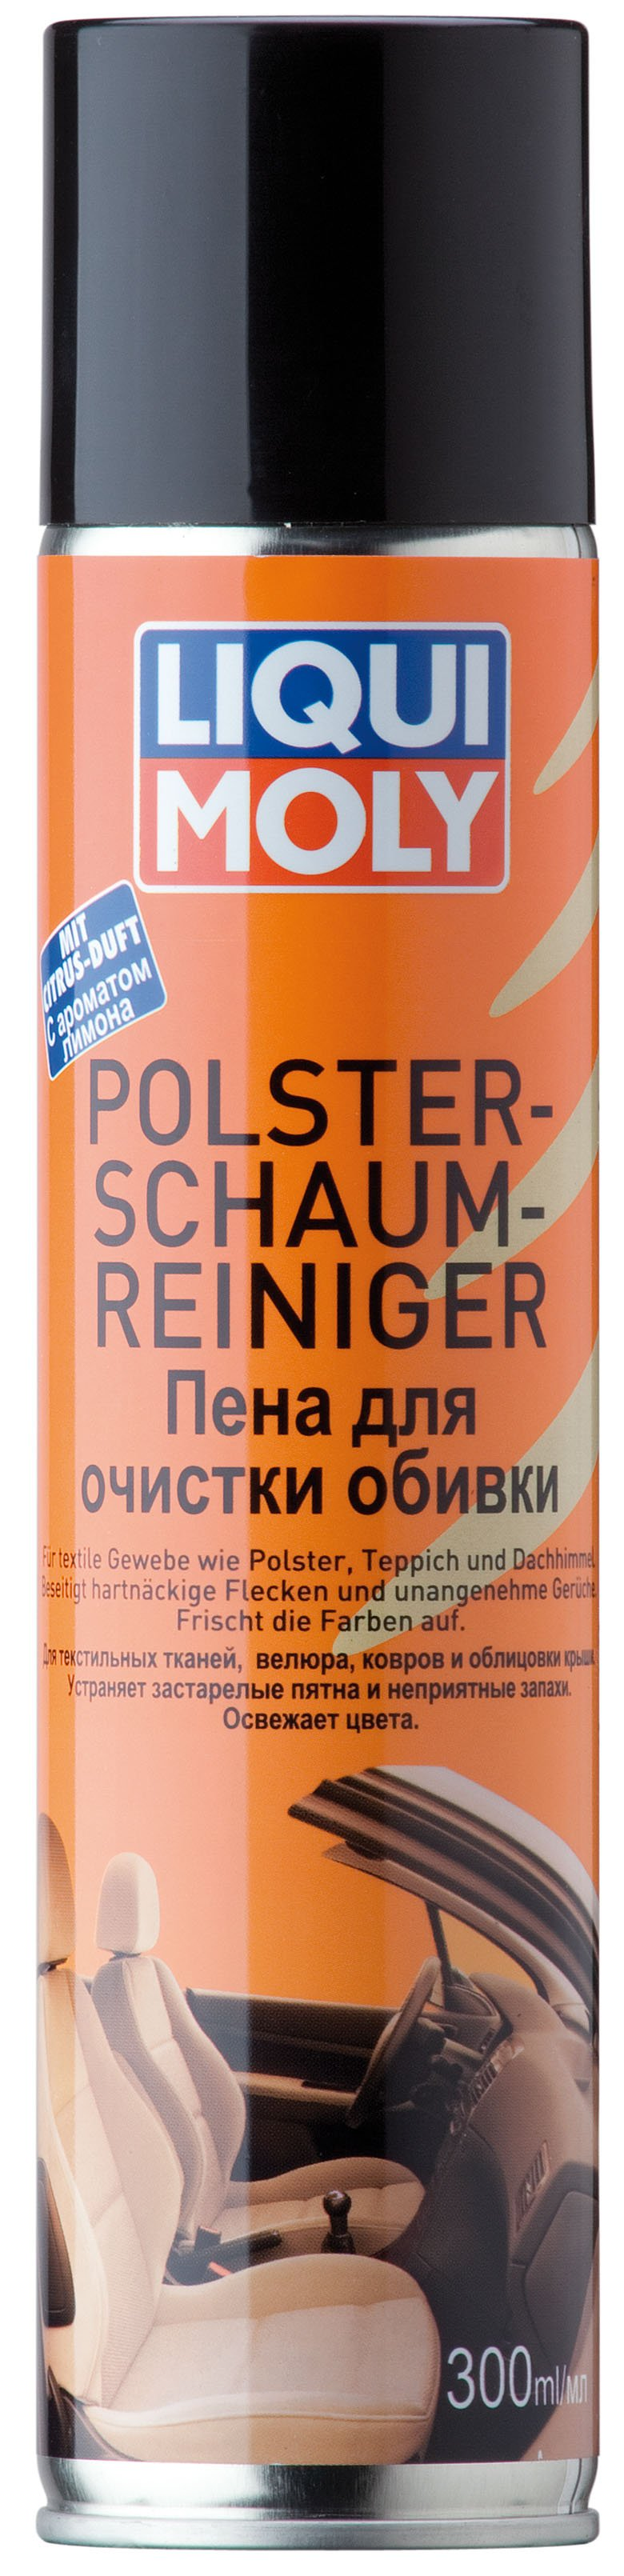 Liqui Moly Polster-Schaum-Reiniger